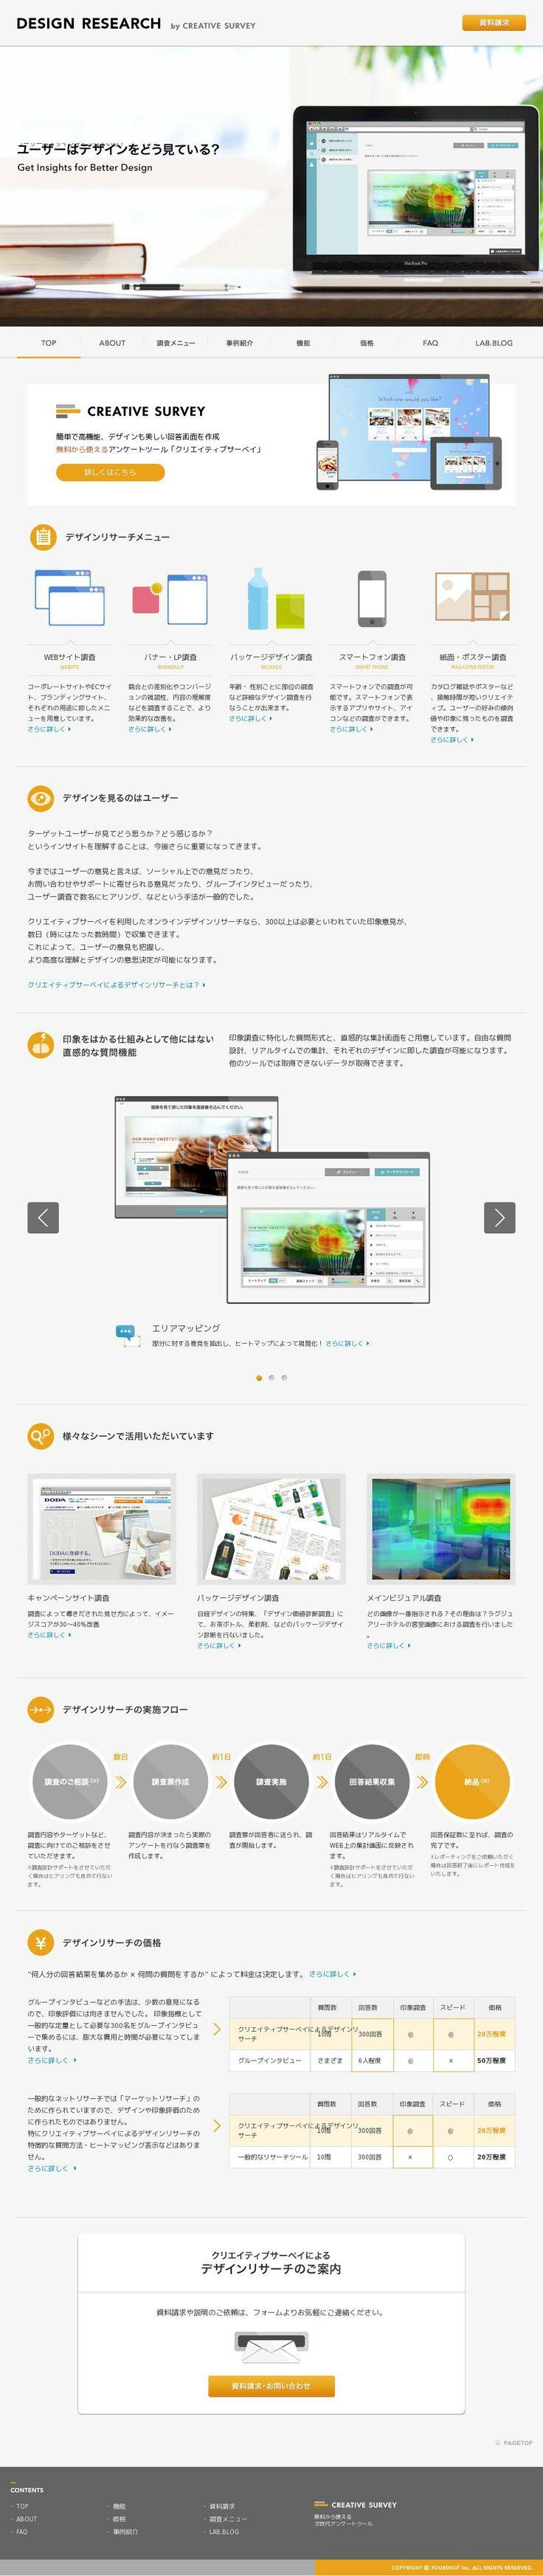 The website 'http://research.creativesurvey.com/' courtesy of @Pinstamatic (http://pinstamatic.com)